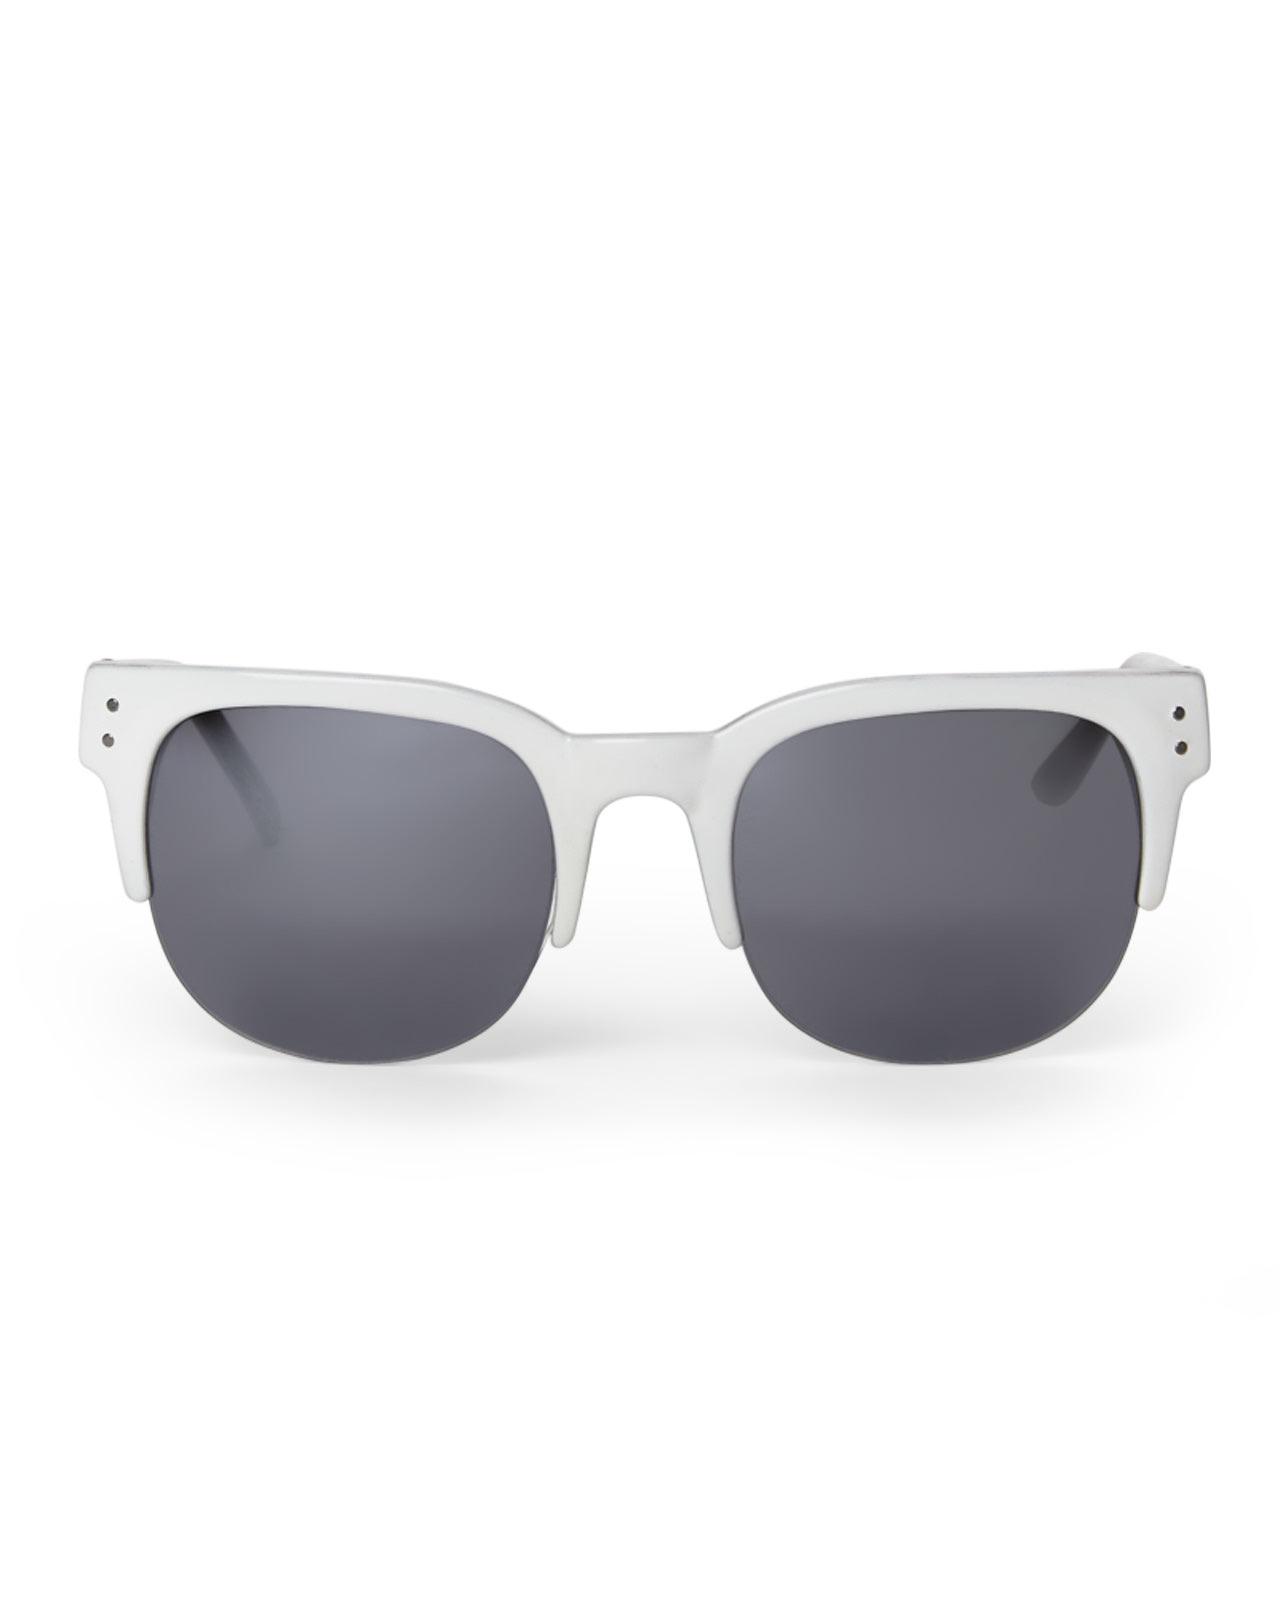 black and gold aviator sunglasses  Cole haan White Half-Rim Wayfarer Sunglasses in White